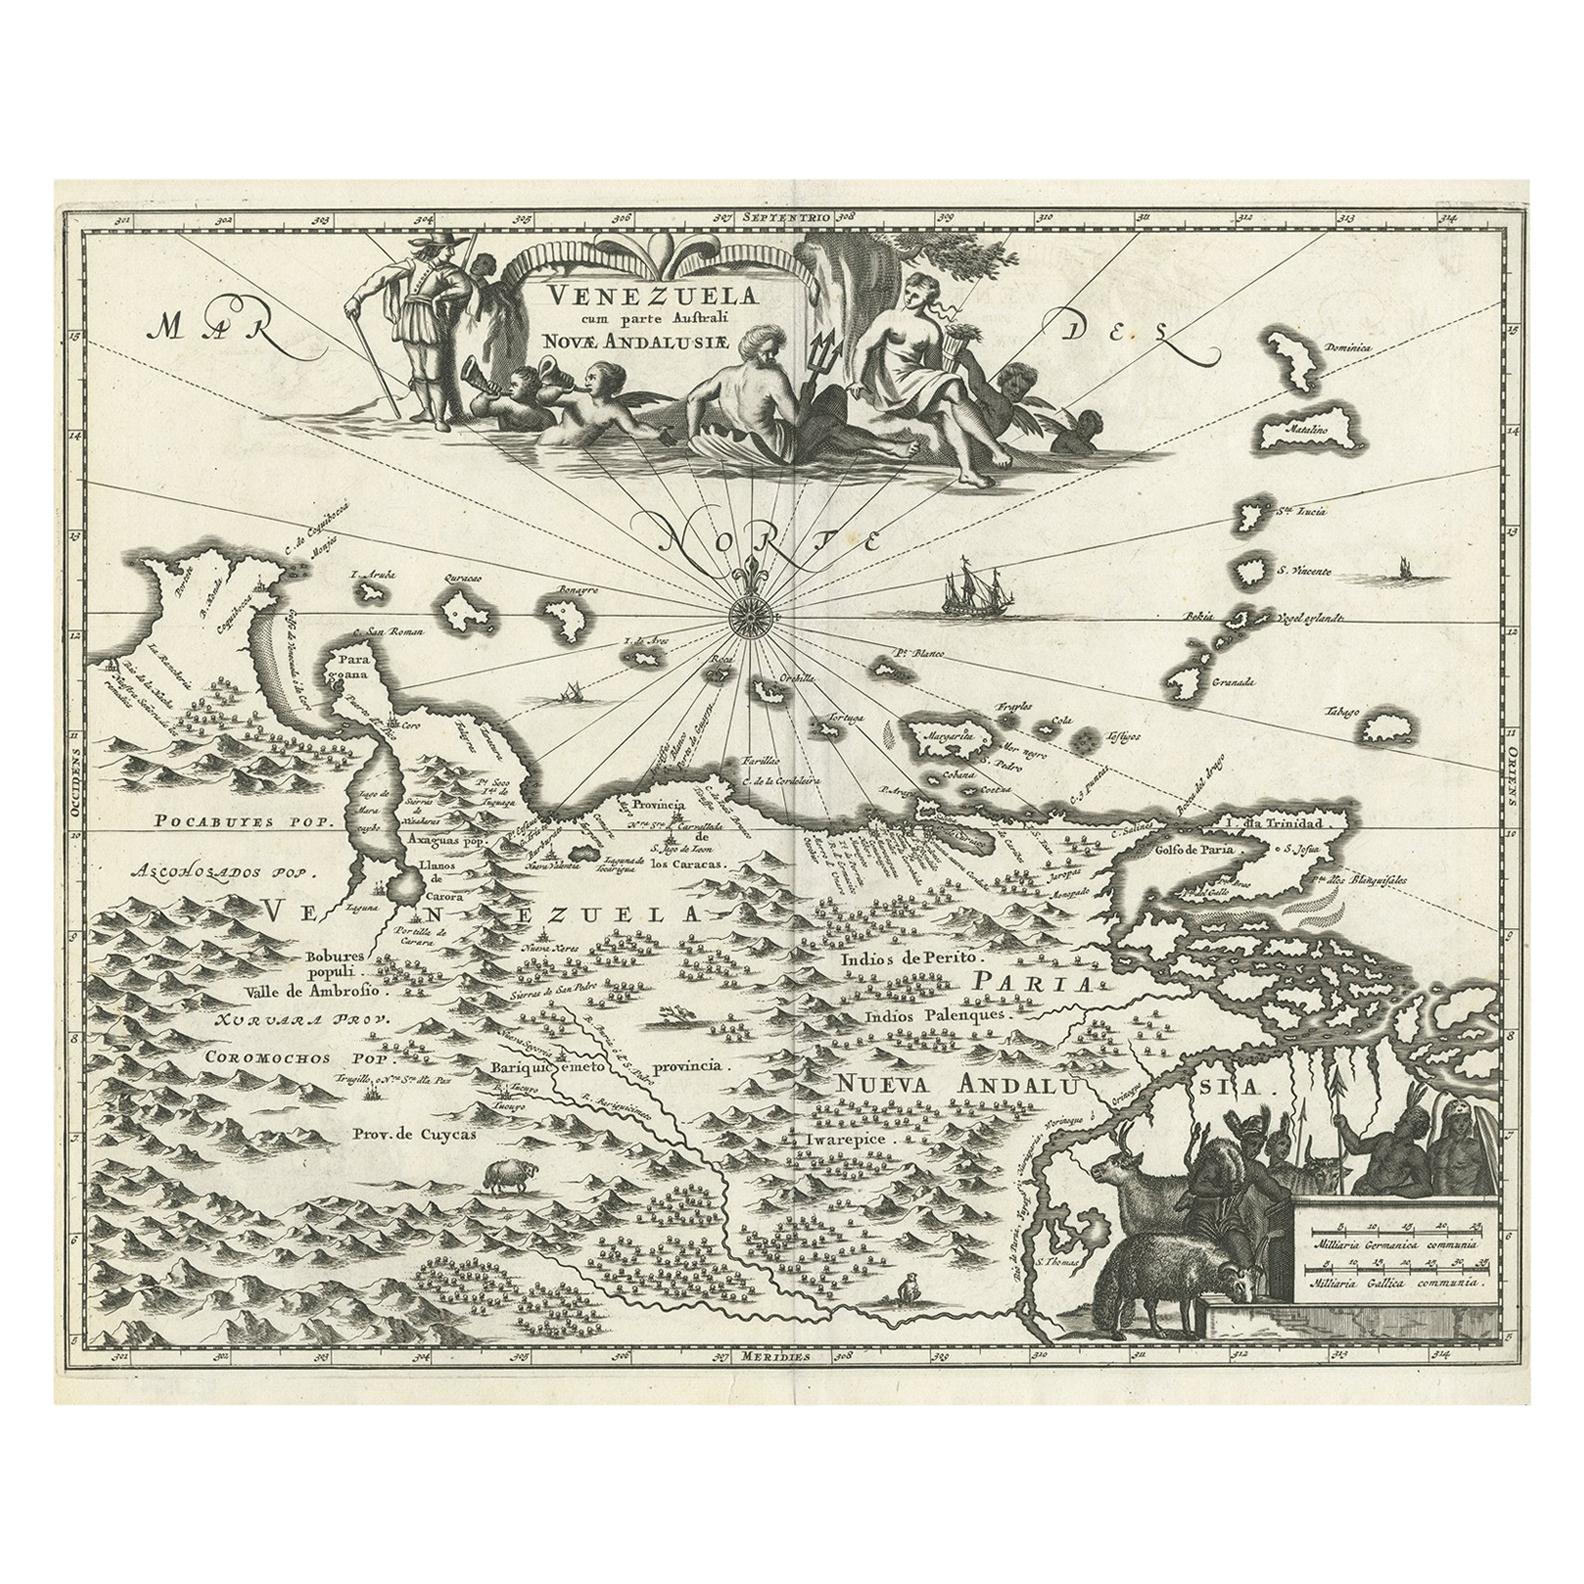 Antique Map of Venezuela by Montanus, 1671